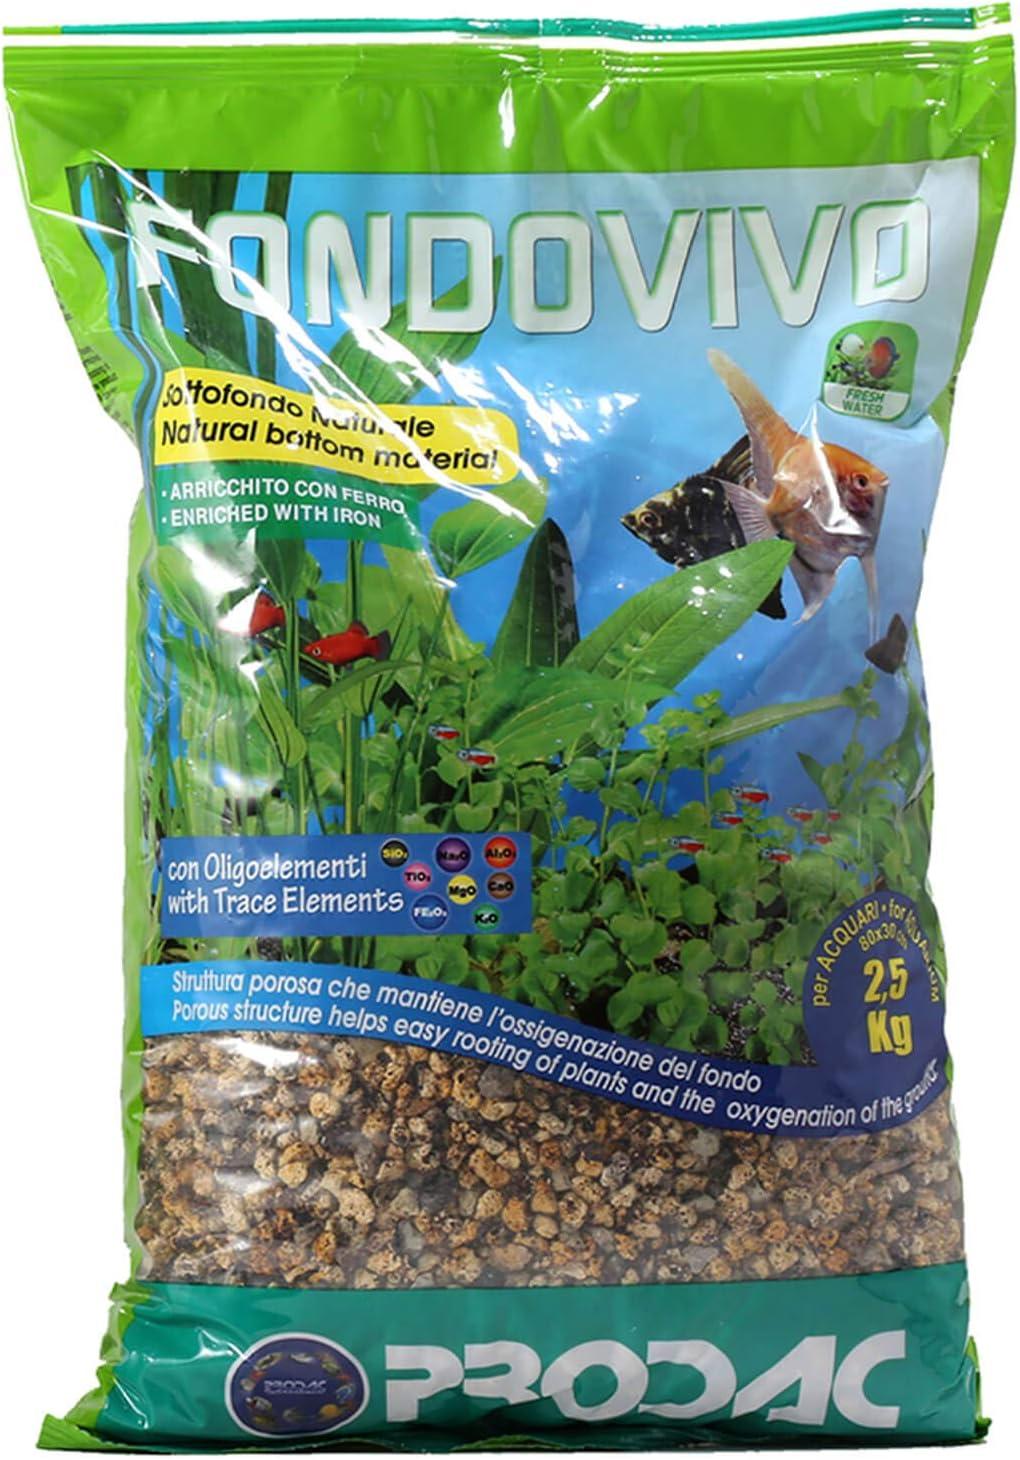 Prodac FondoVivo - Sustrato natural para acuario, 2,5 kg